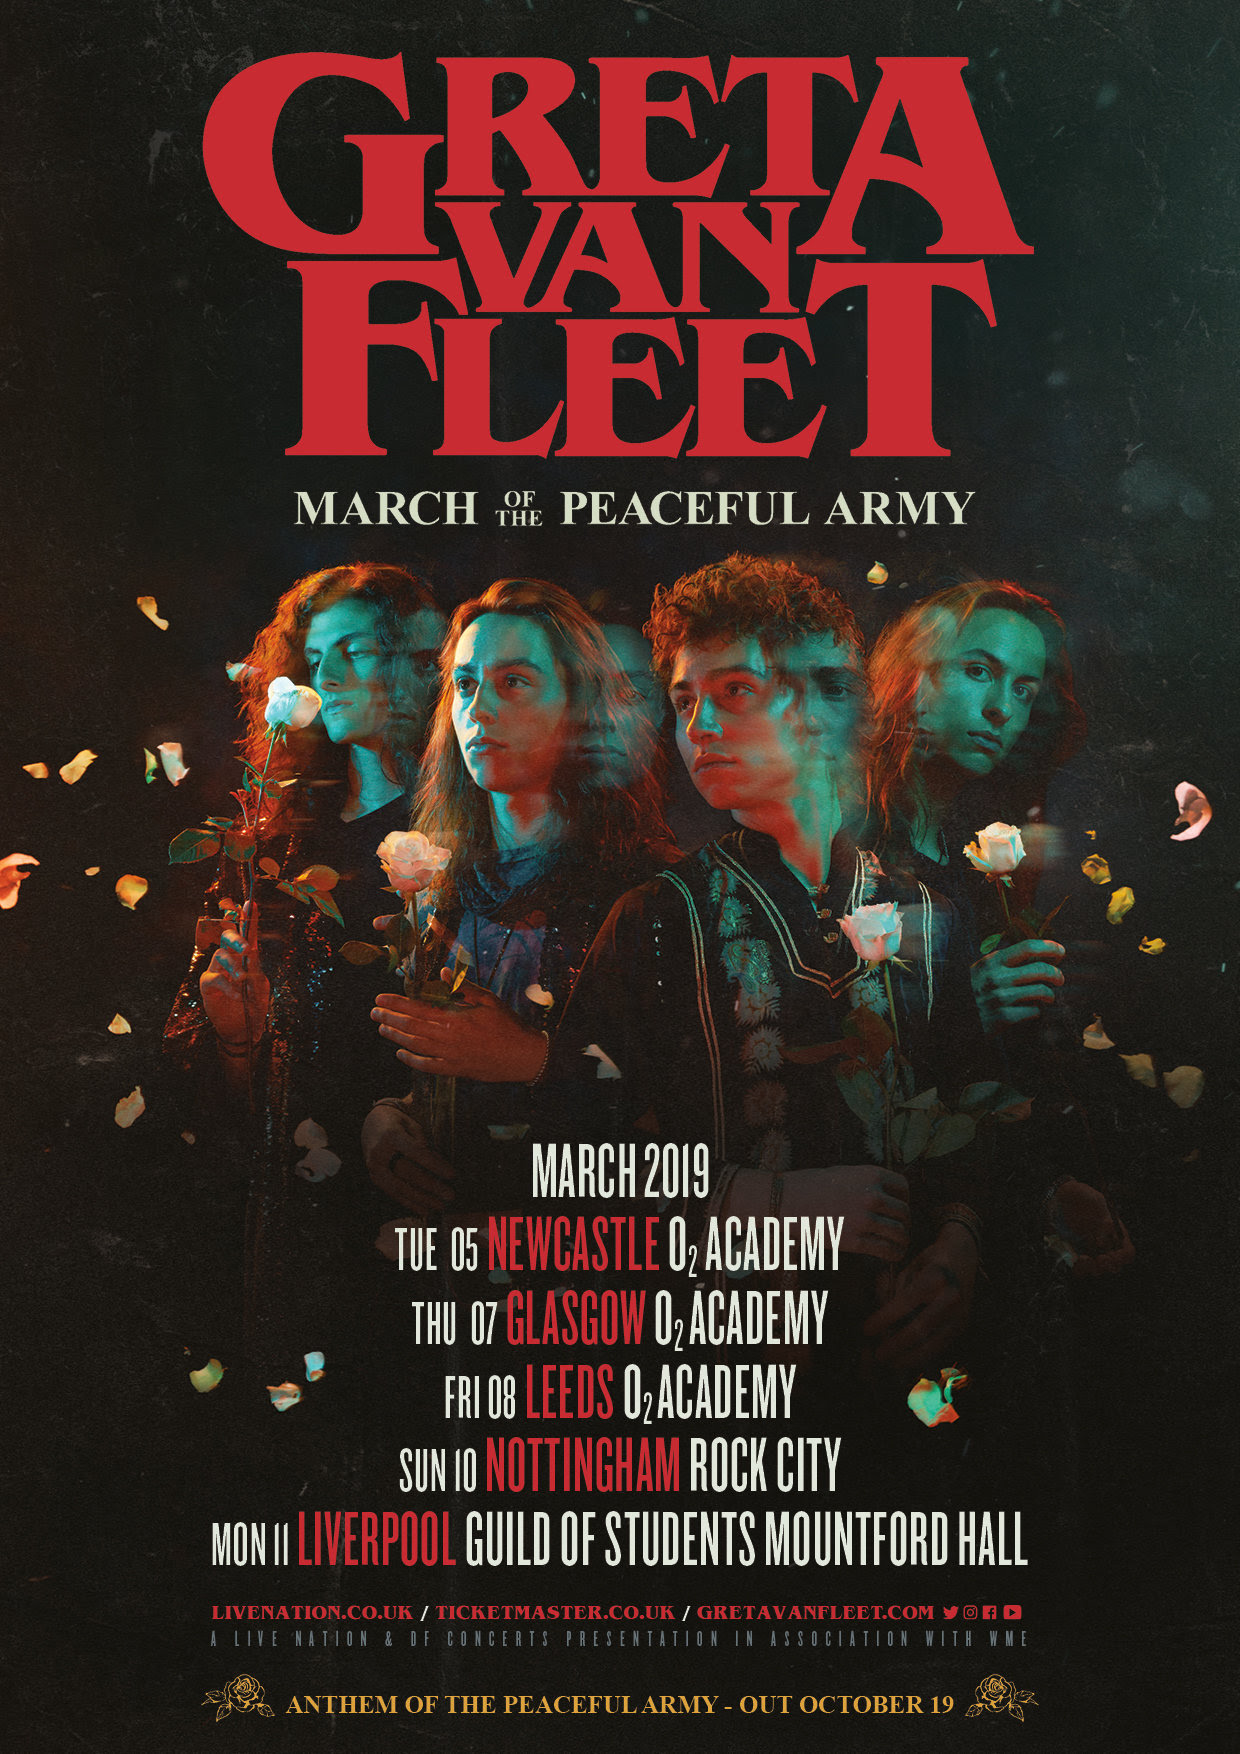 Greta Van fleet, Tour, TotalNtertainment, Leeds, Music